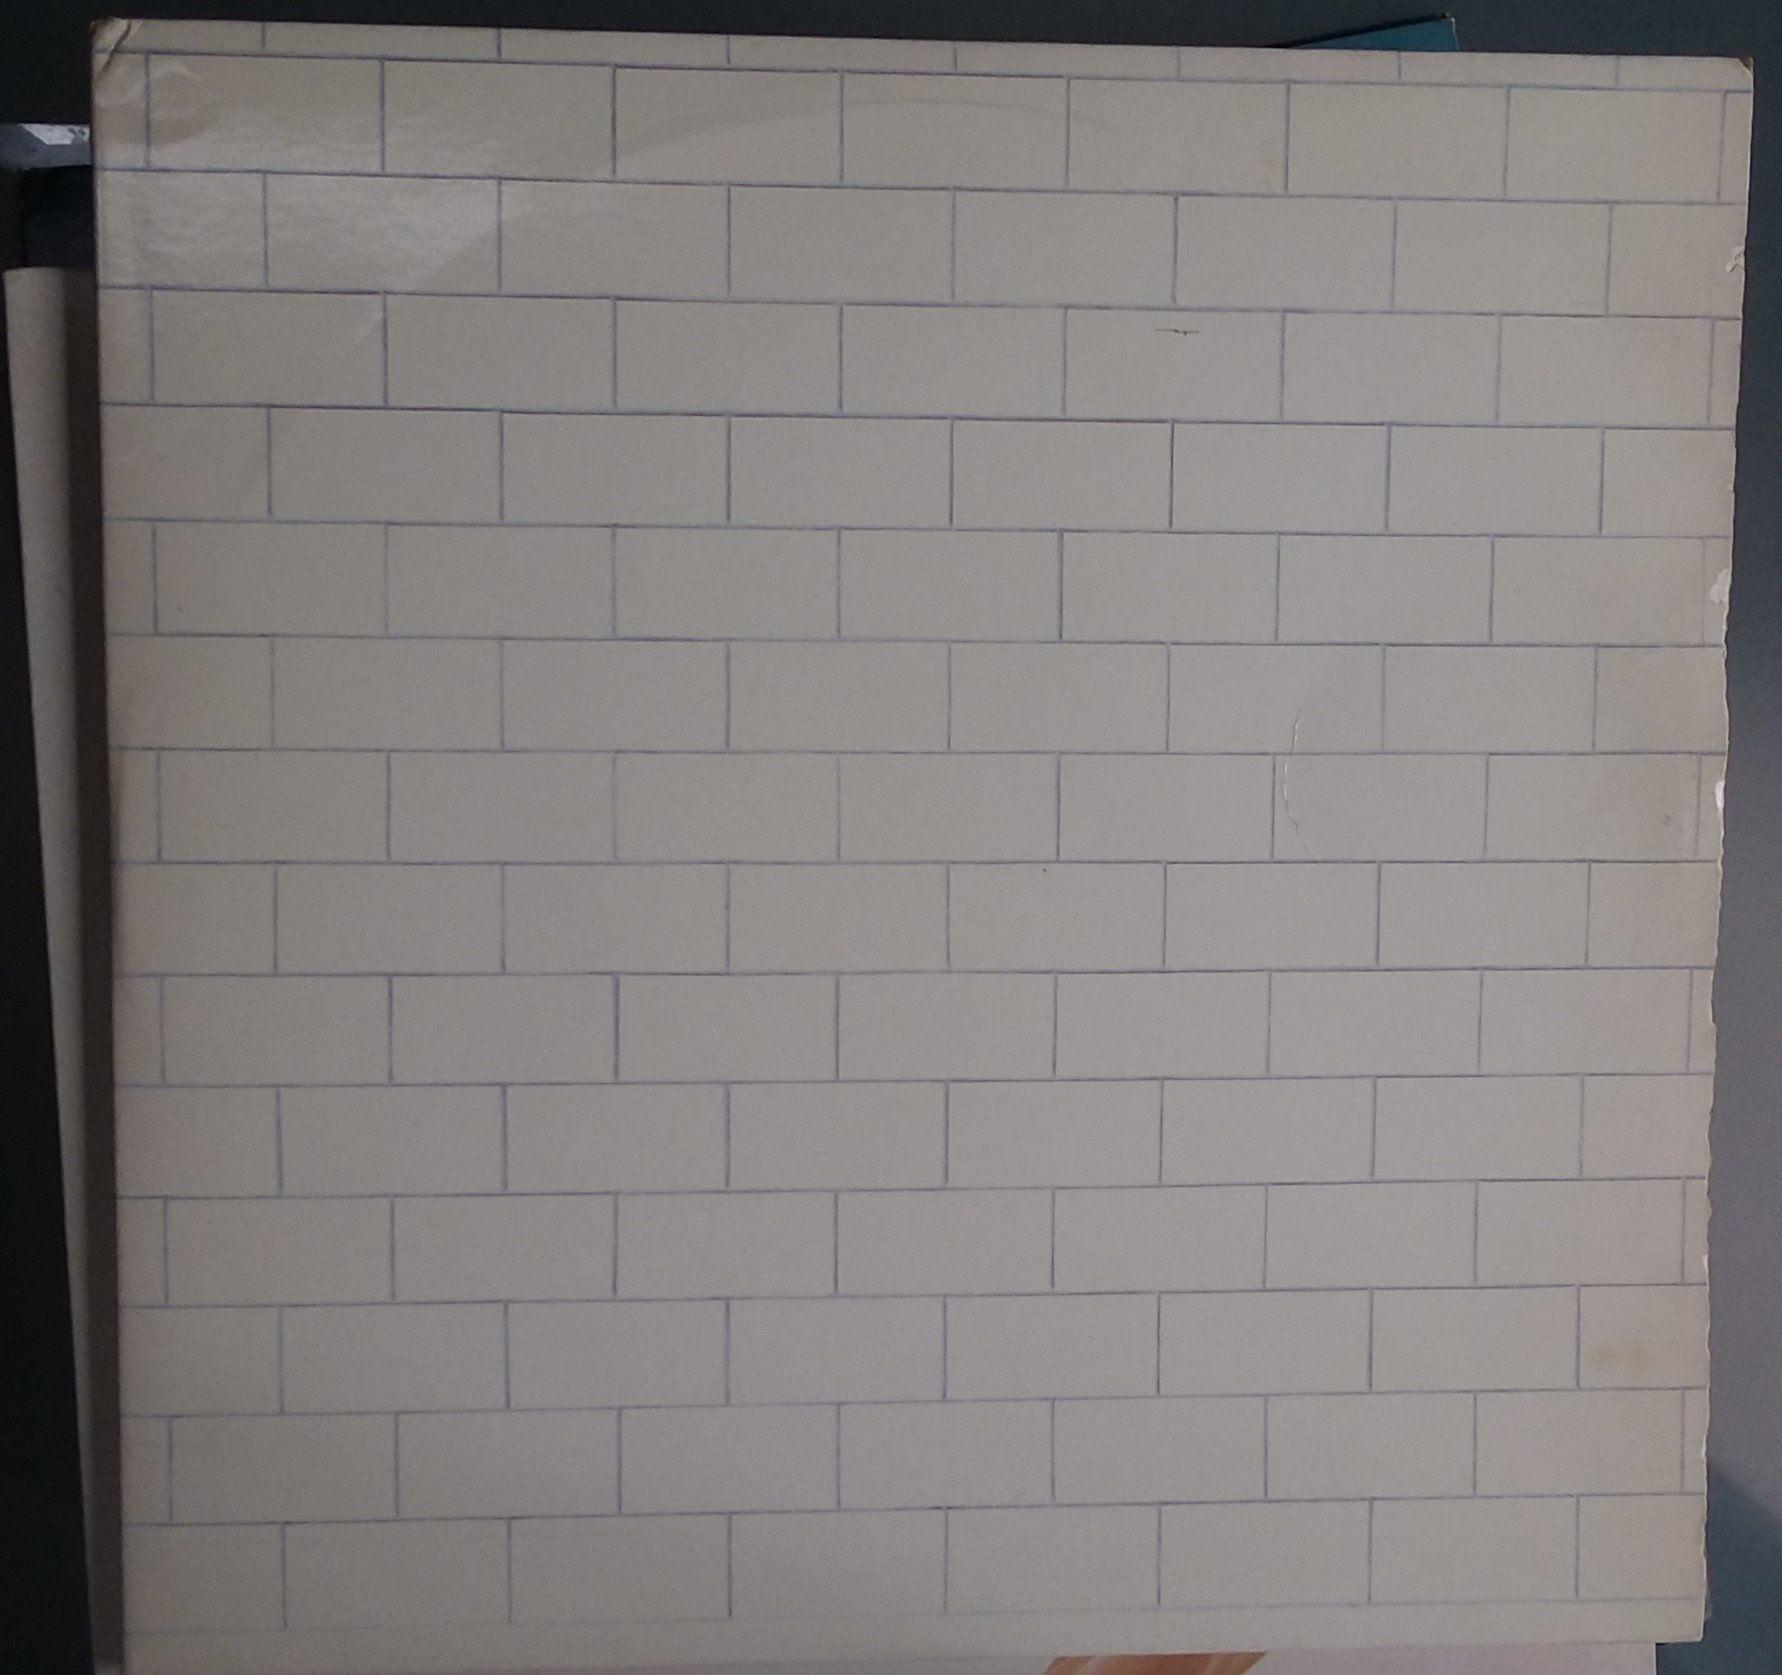 Pink Floyd The Wall Double Album Set 1979 Release Vintage Record Album Vinyl Lp Classic Progressive Rock Mus Pink Floyd Albums Rock Opera Vintage Records